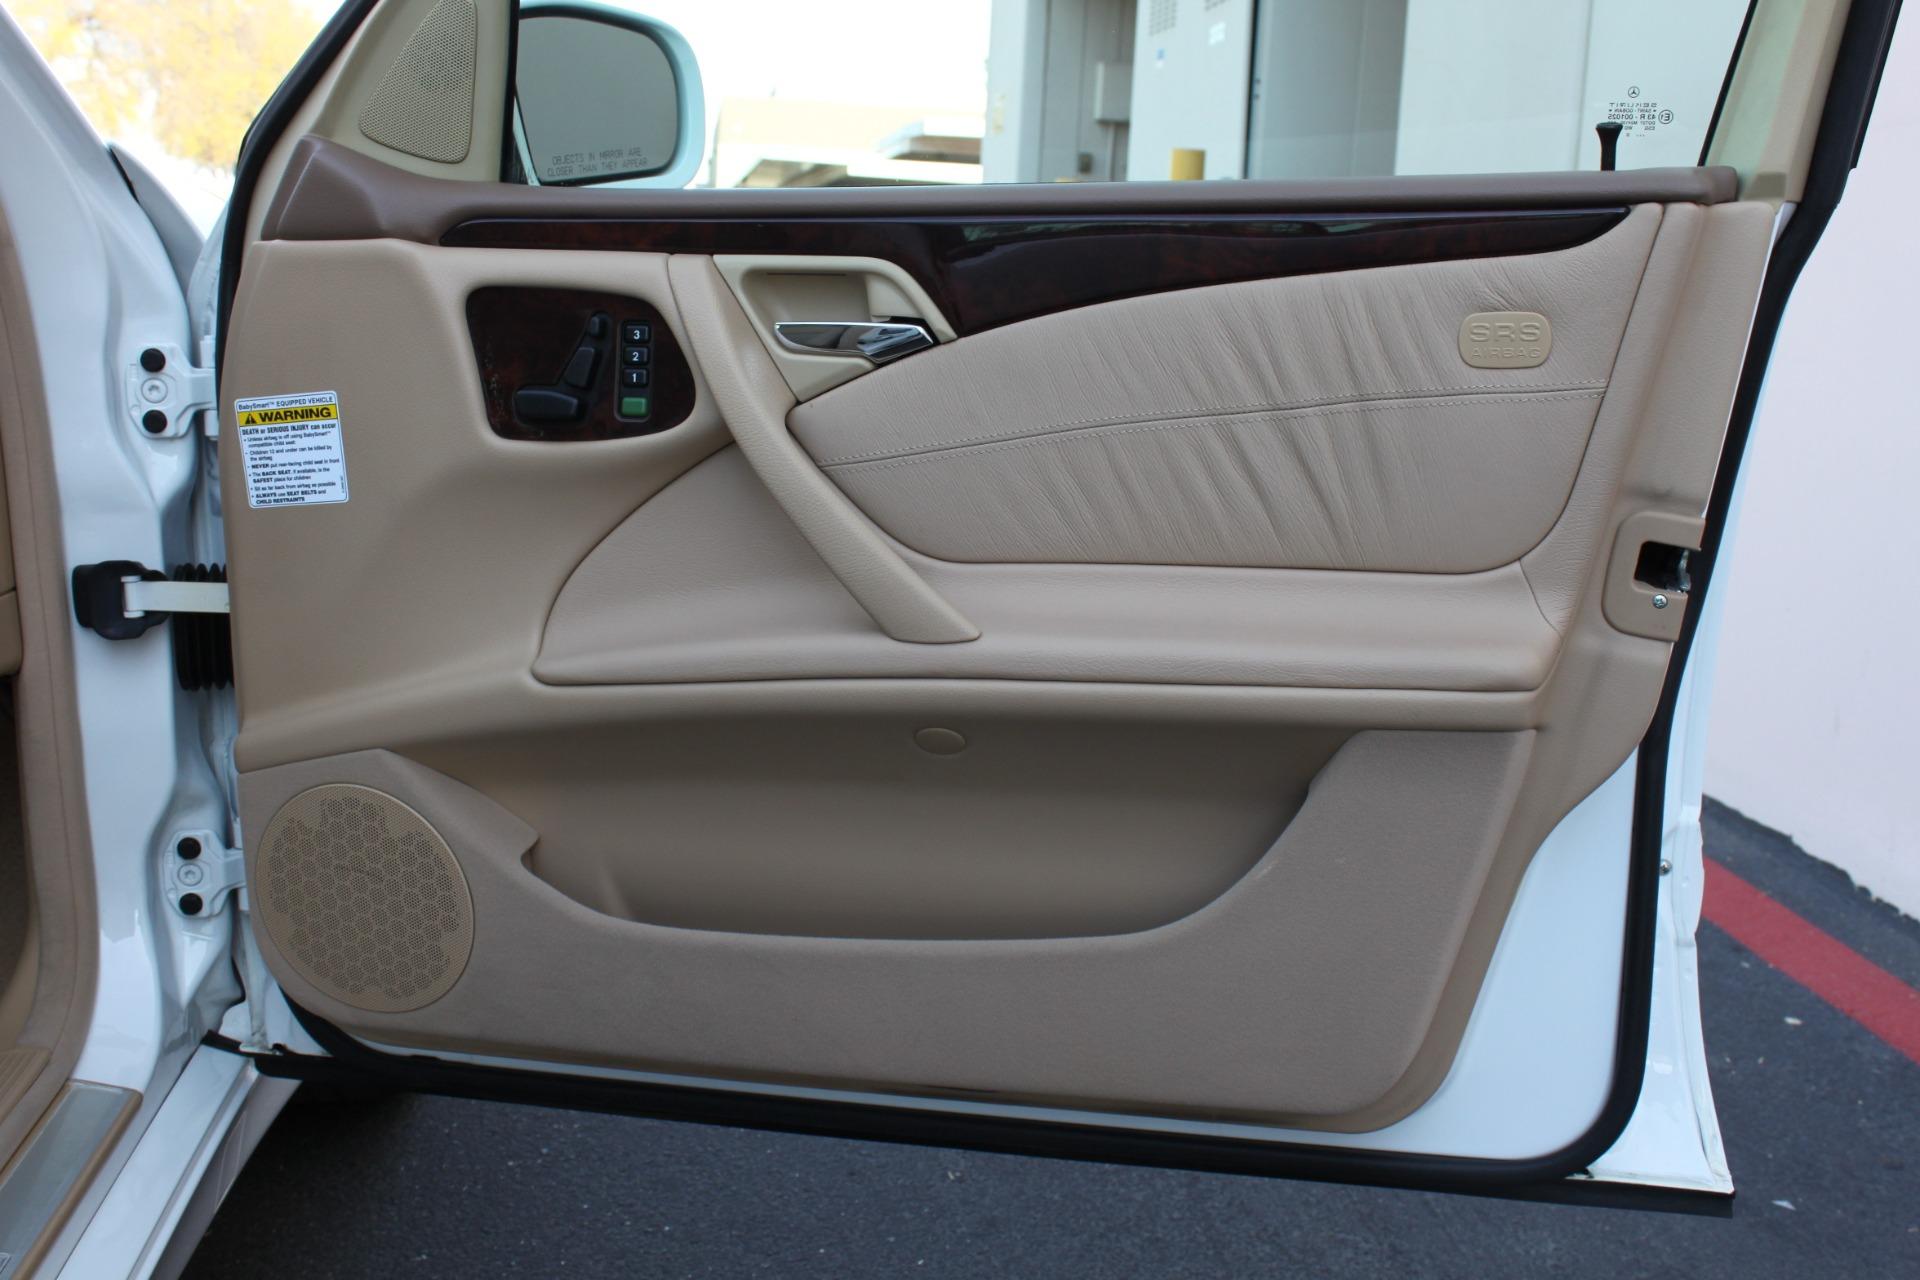 Used-2000-Mercedes-Benz-E-Class-Wrangler